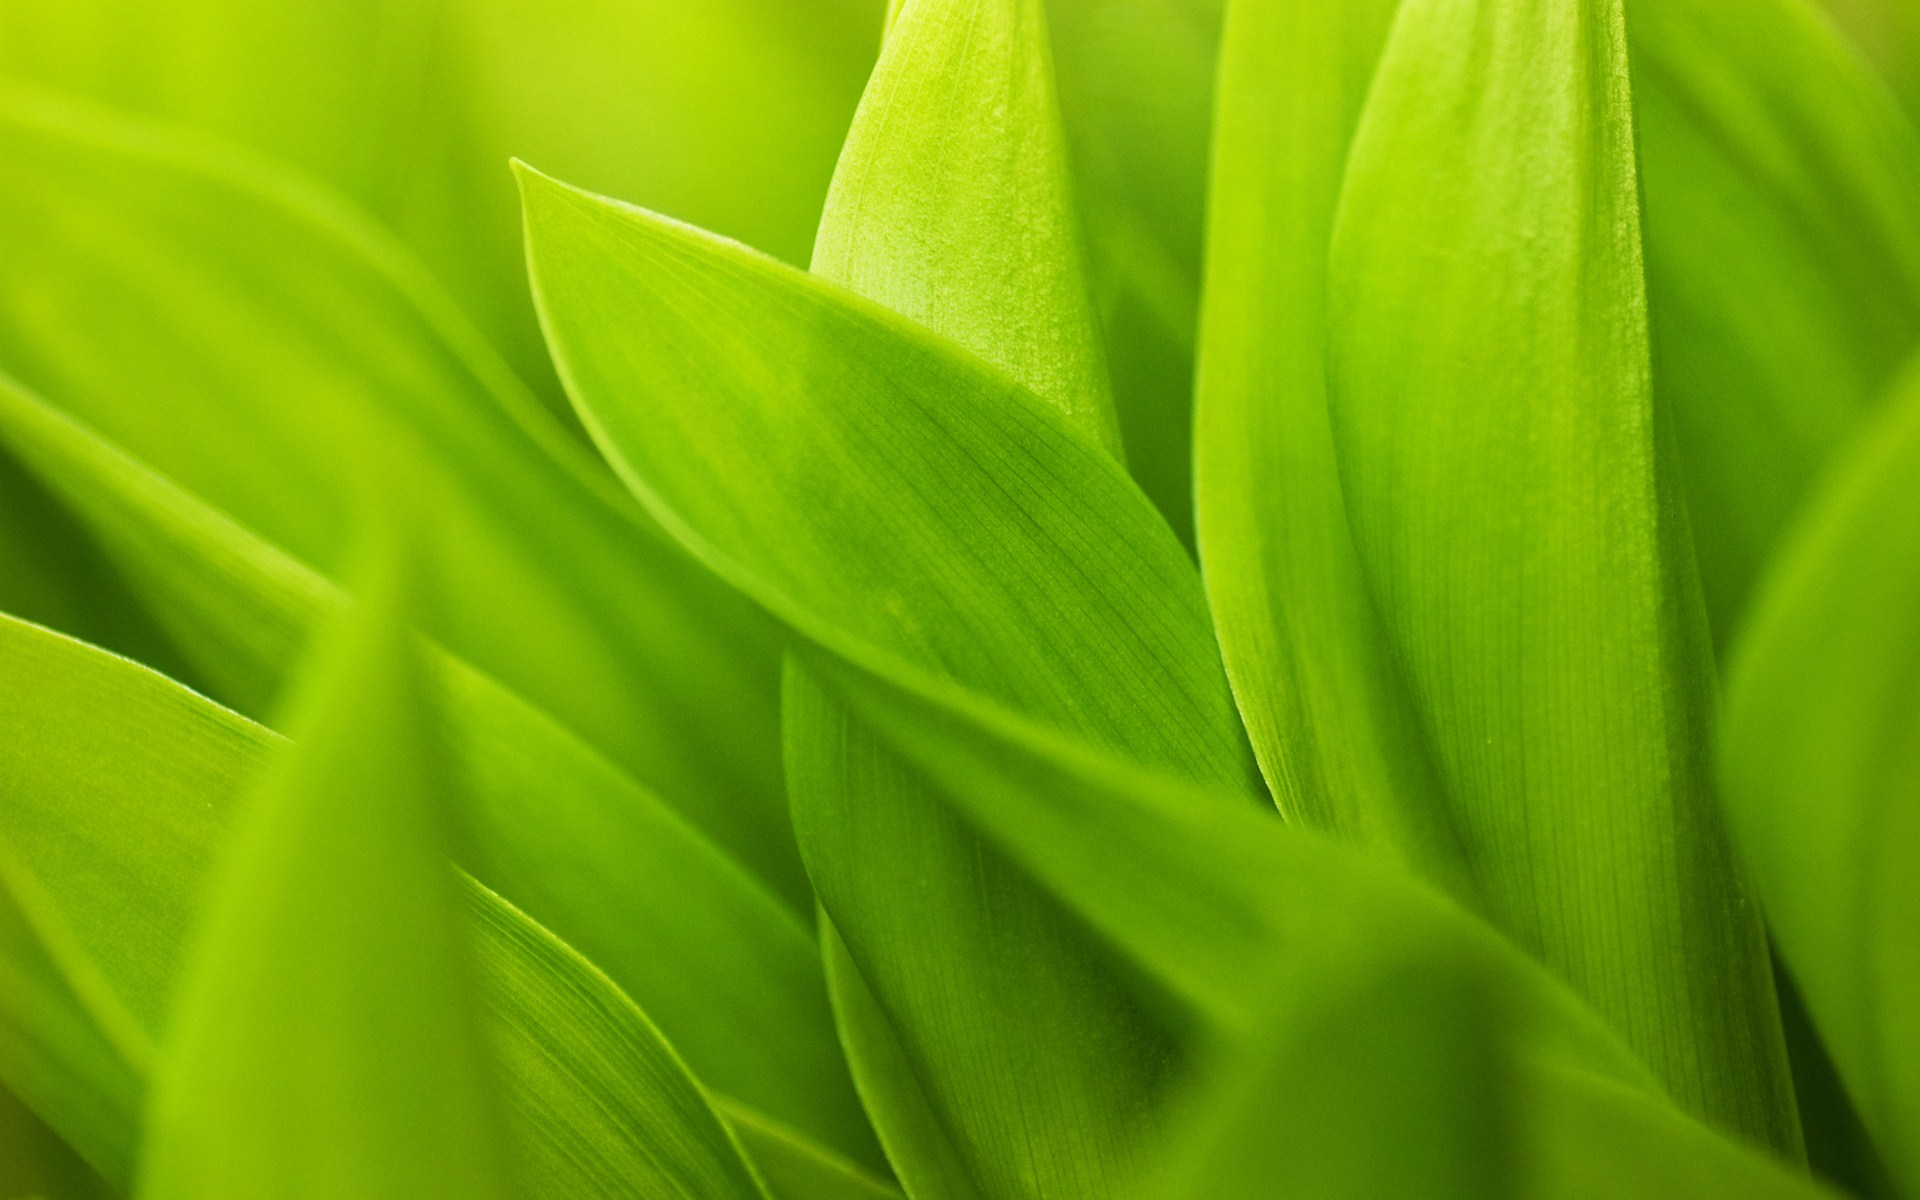 Leaf Macro Wallpaper HD